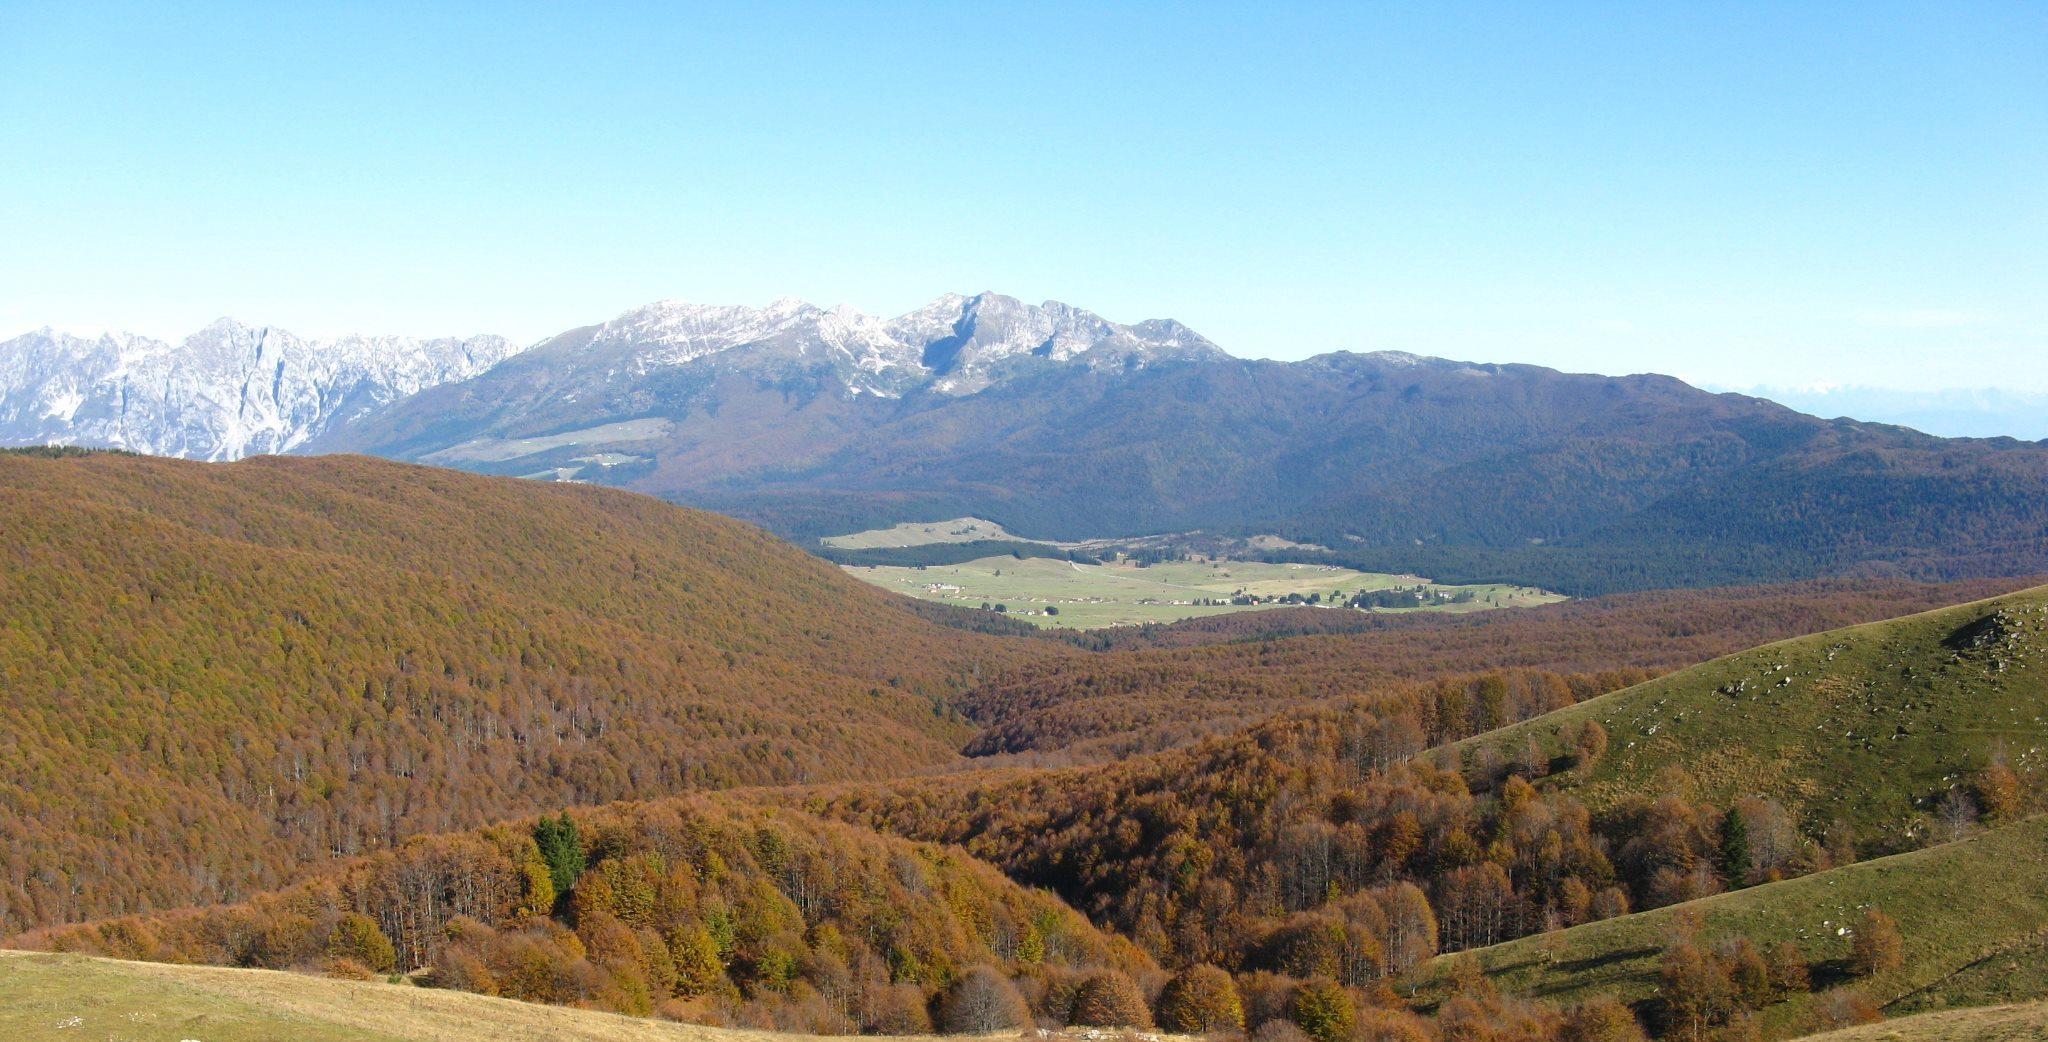 eroica15-18_Vertikal_Pizzoc_panorama_cansiglio_montagna_belluno_treviso